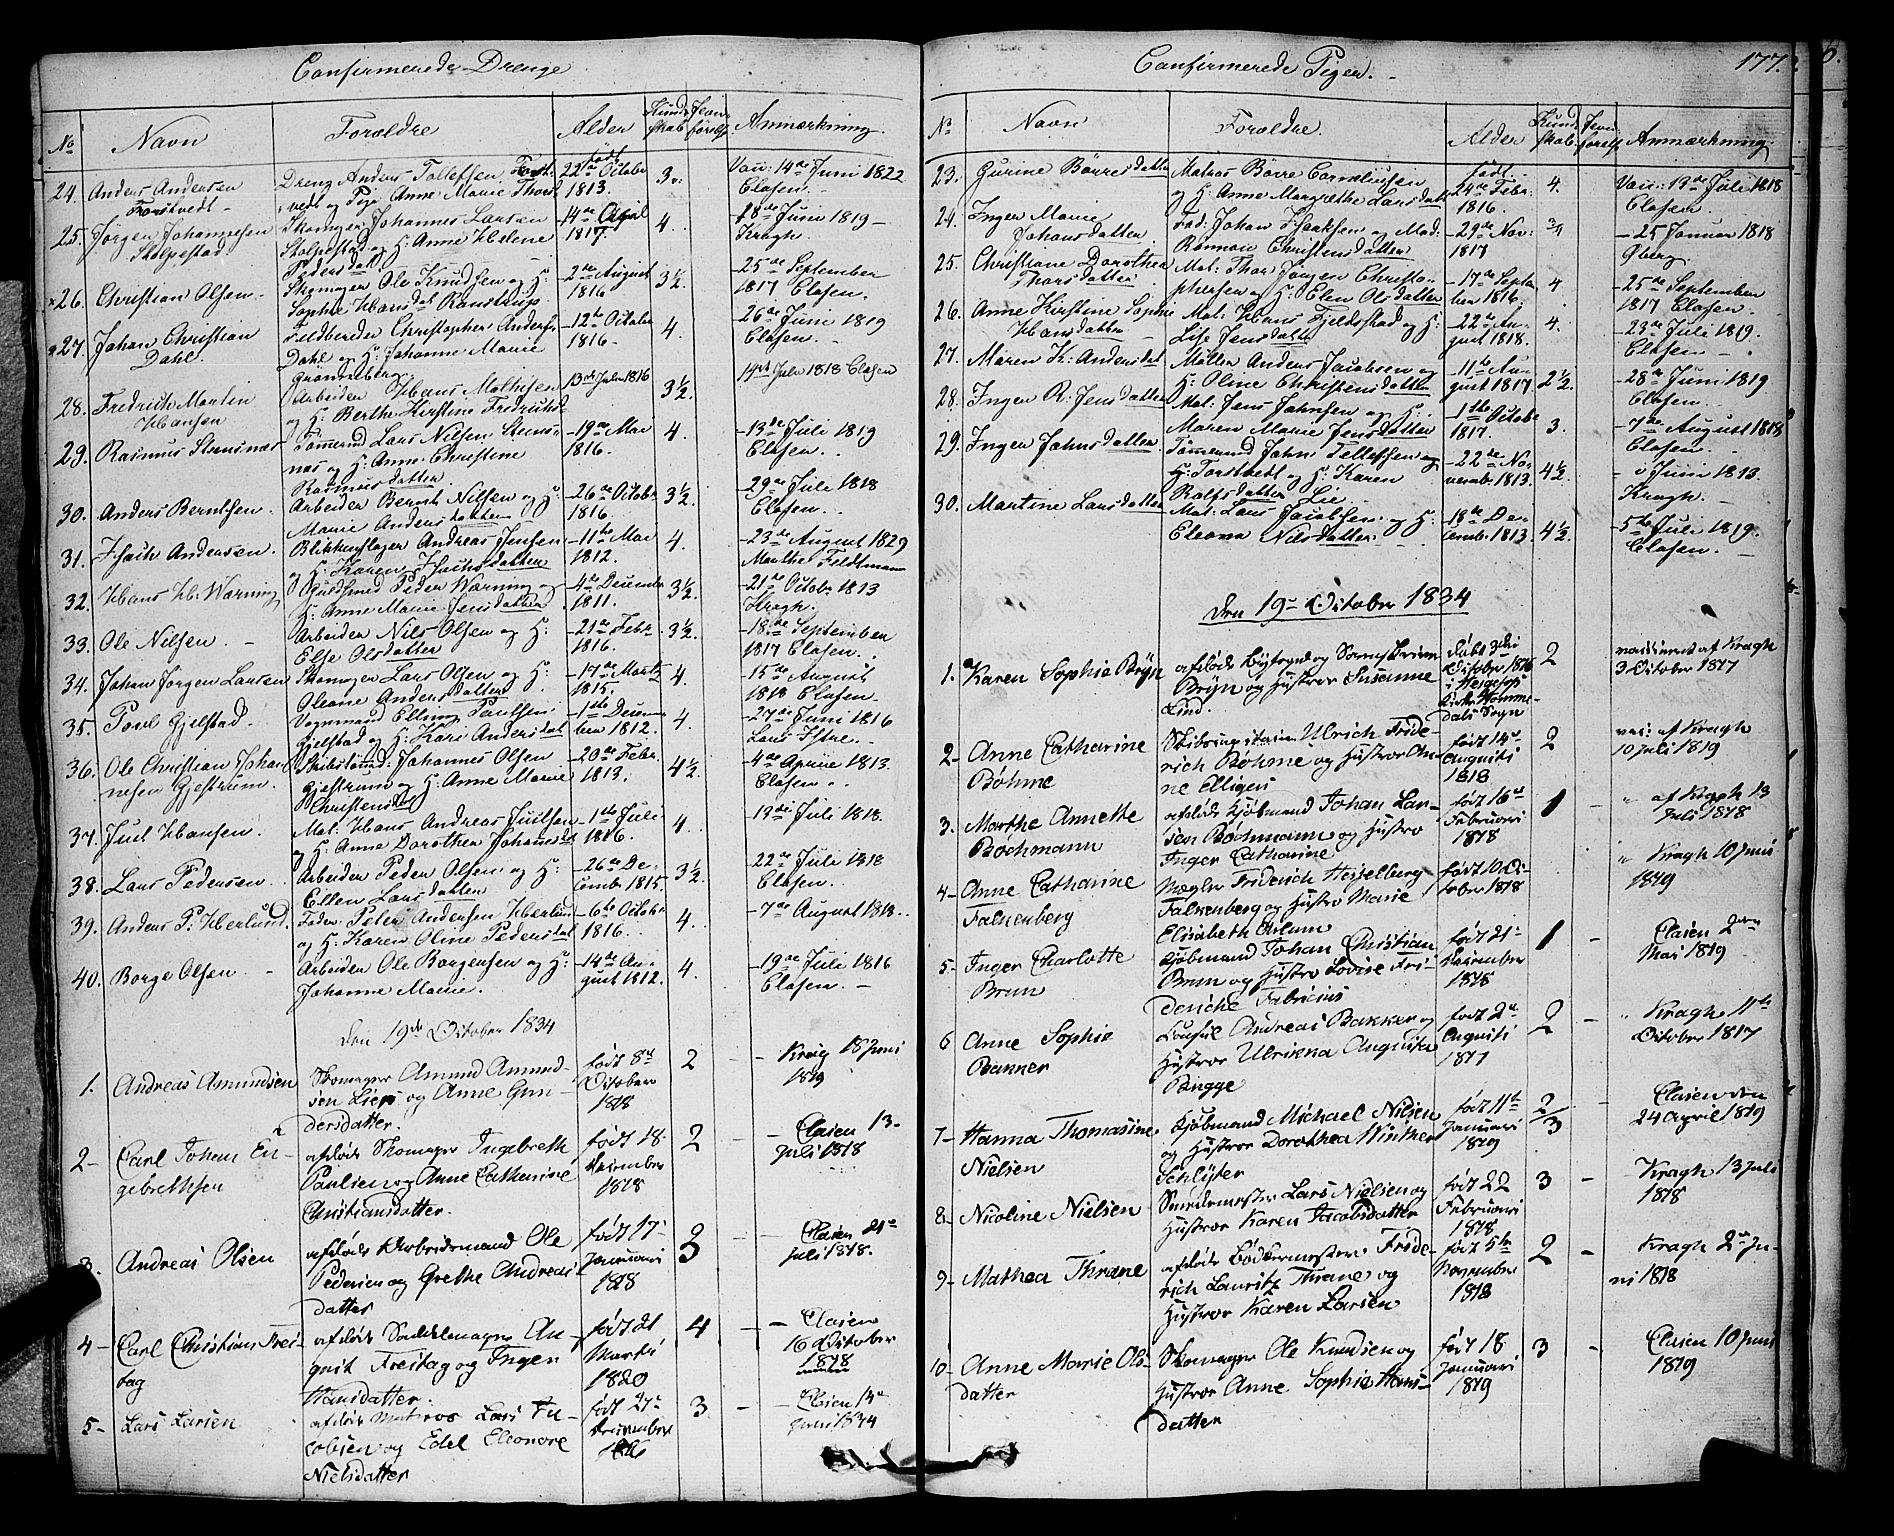 SAKO, Larvik kirkebøker, F/Fa/L0002: Ministerialbok nr. I 2, 1825-1847, s. 177